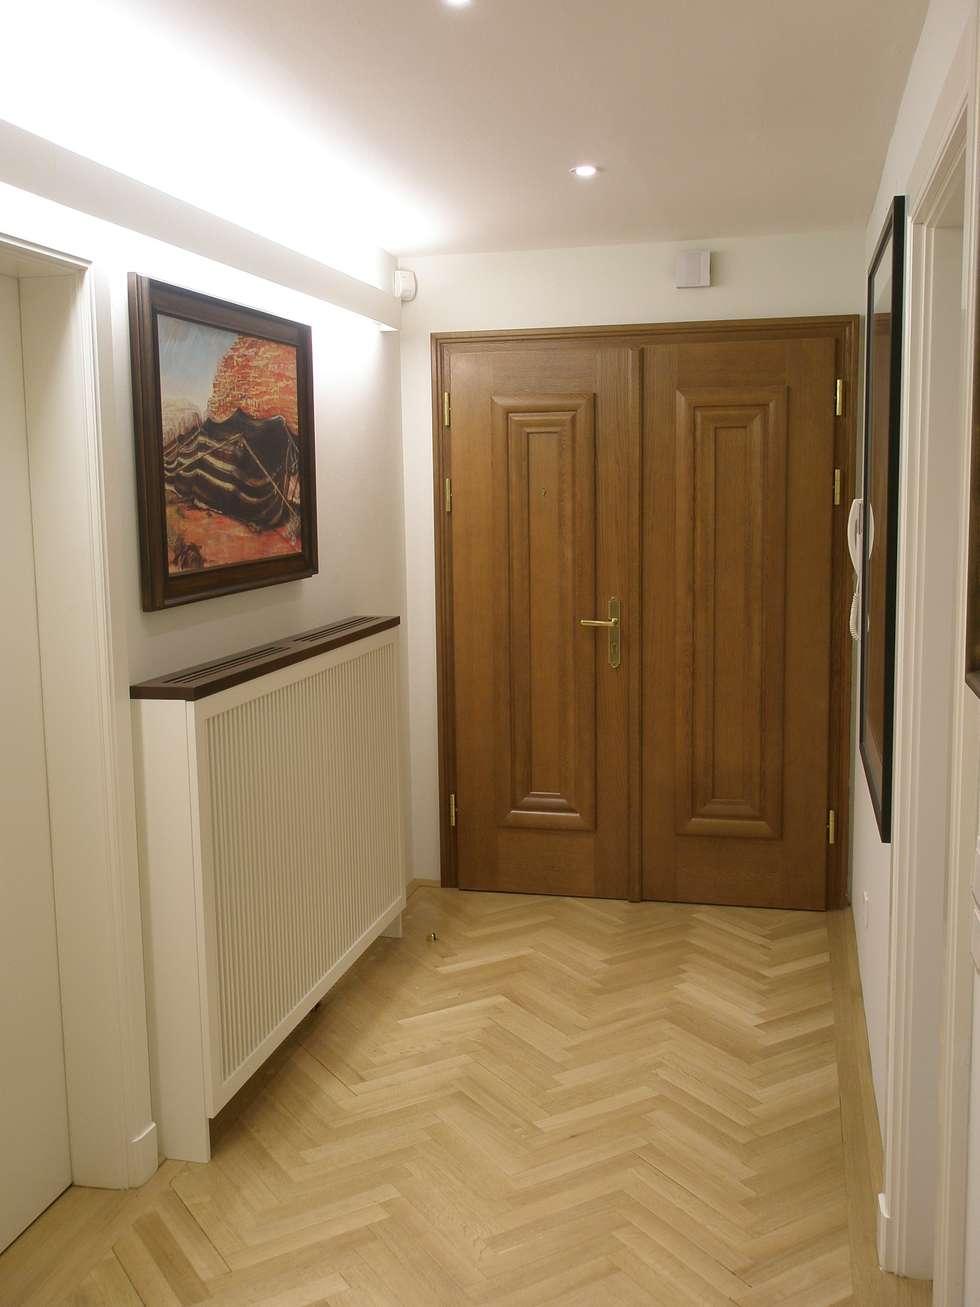 Apartment:  Flur & Diele von Elke Altenberger Interior Design & Consulting